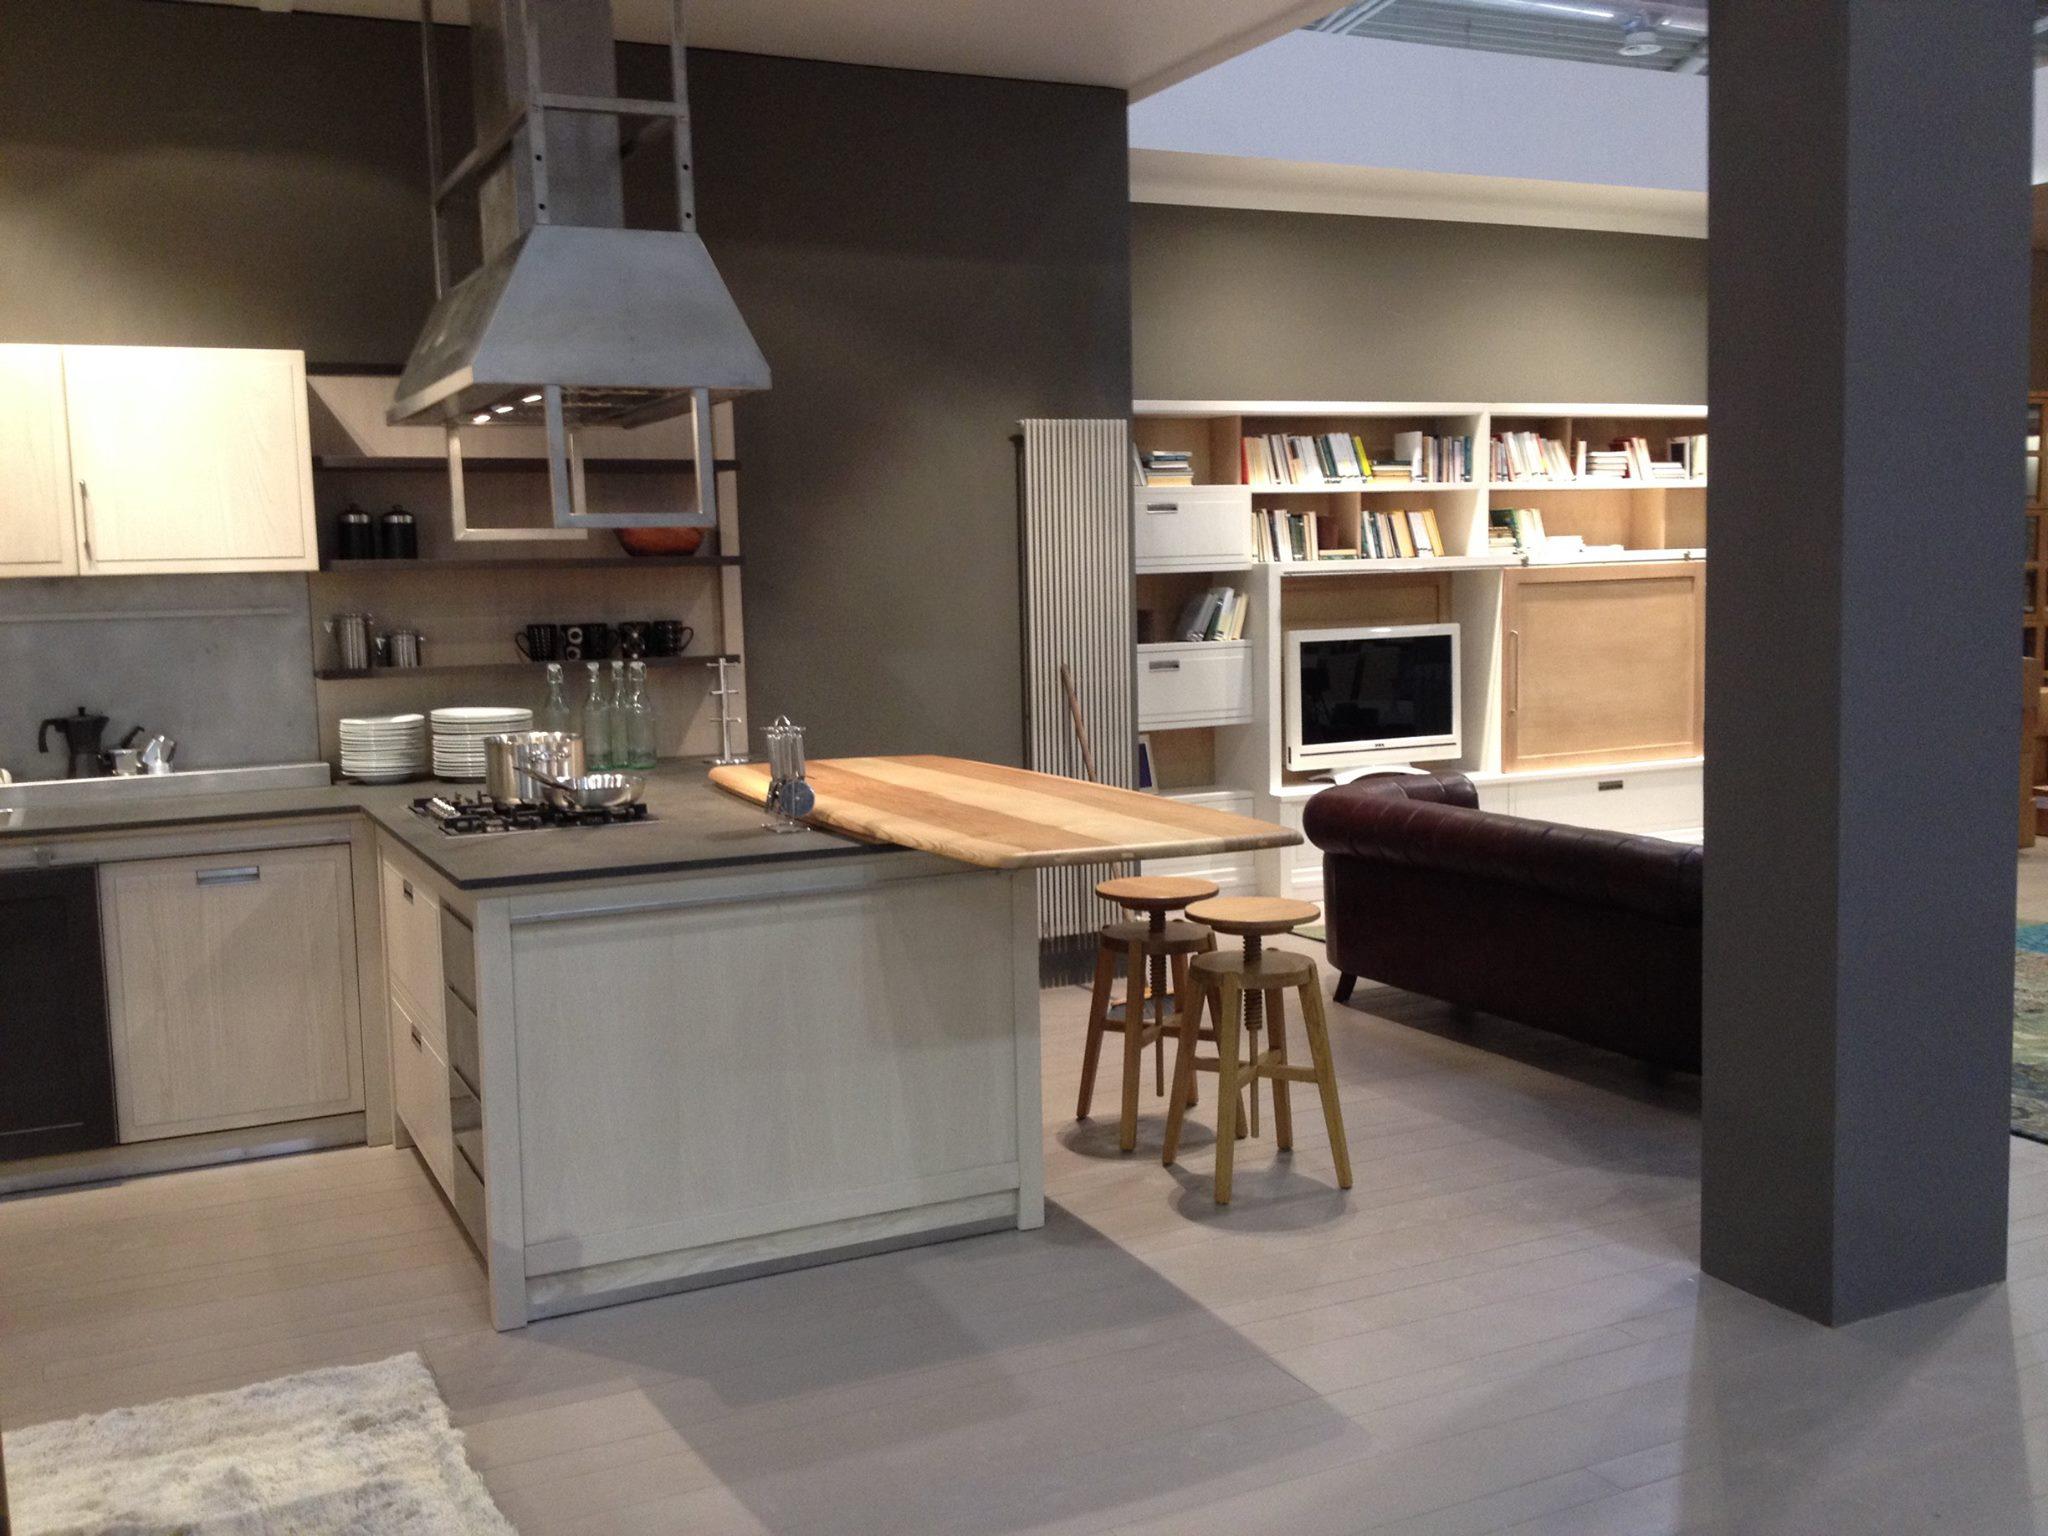 Cucine industrial chic l 39 ottocento tetesi arredamenti for Cucine in stile